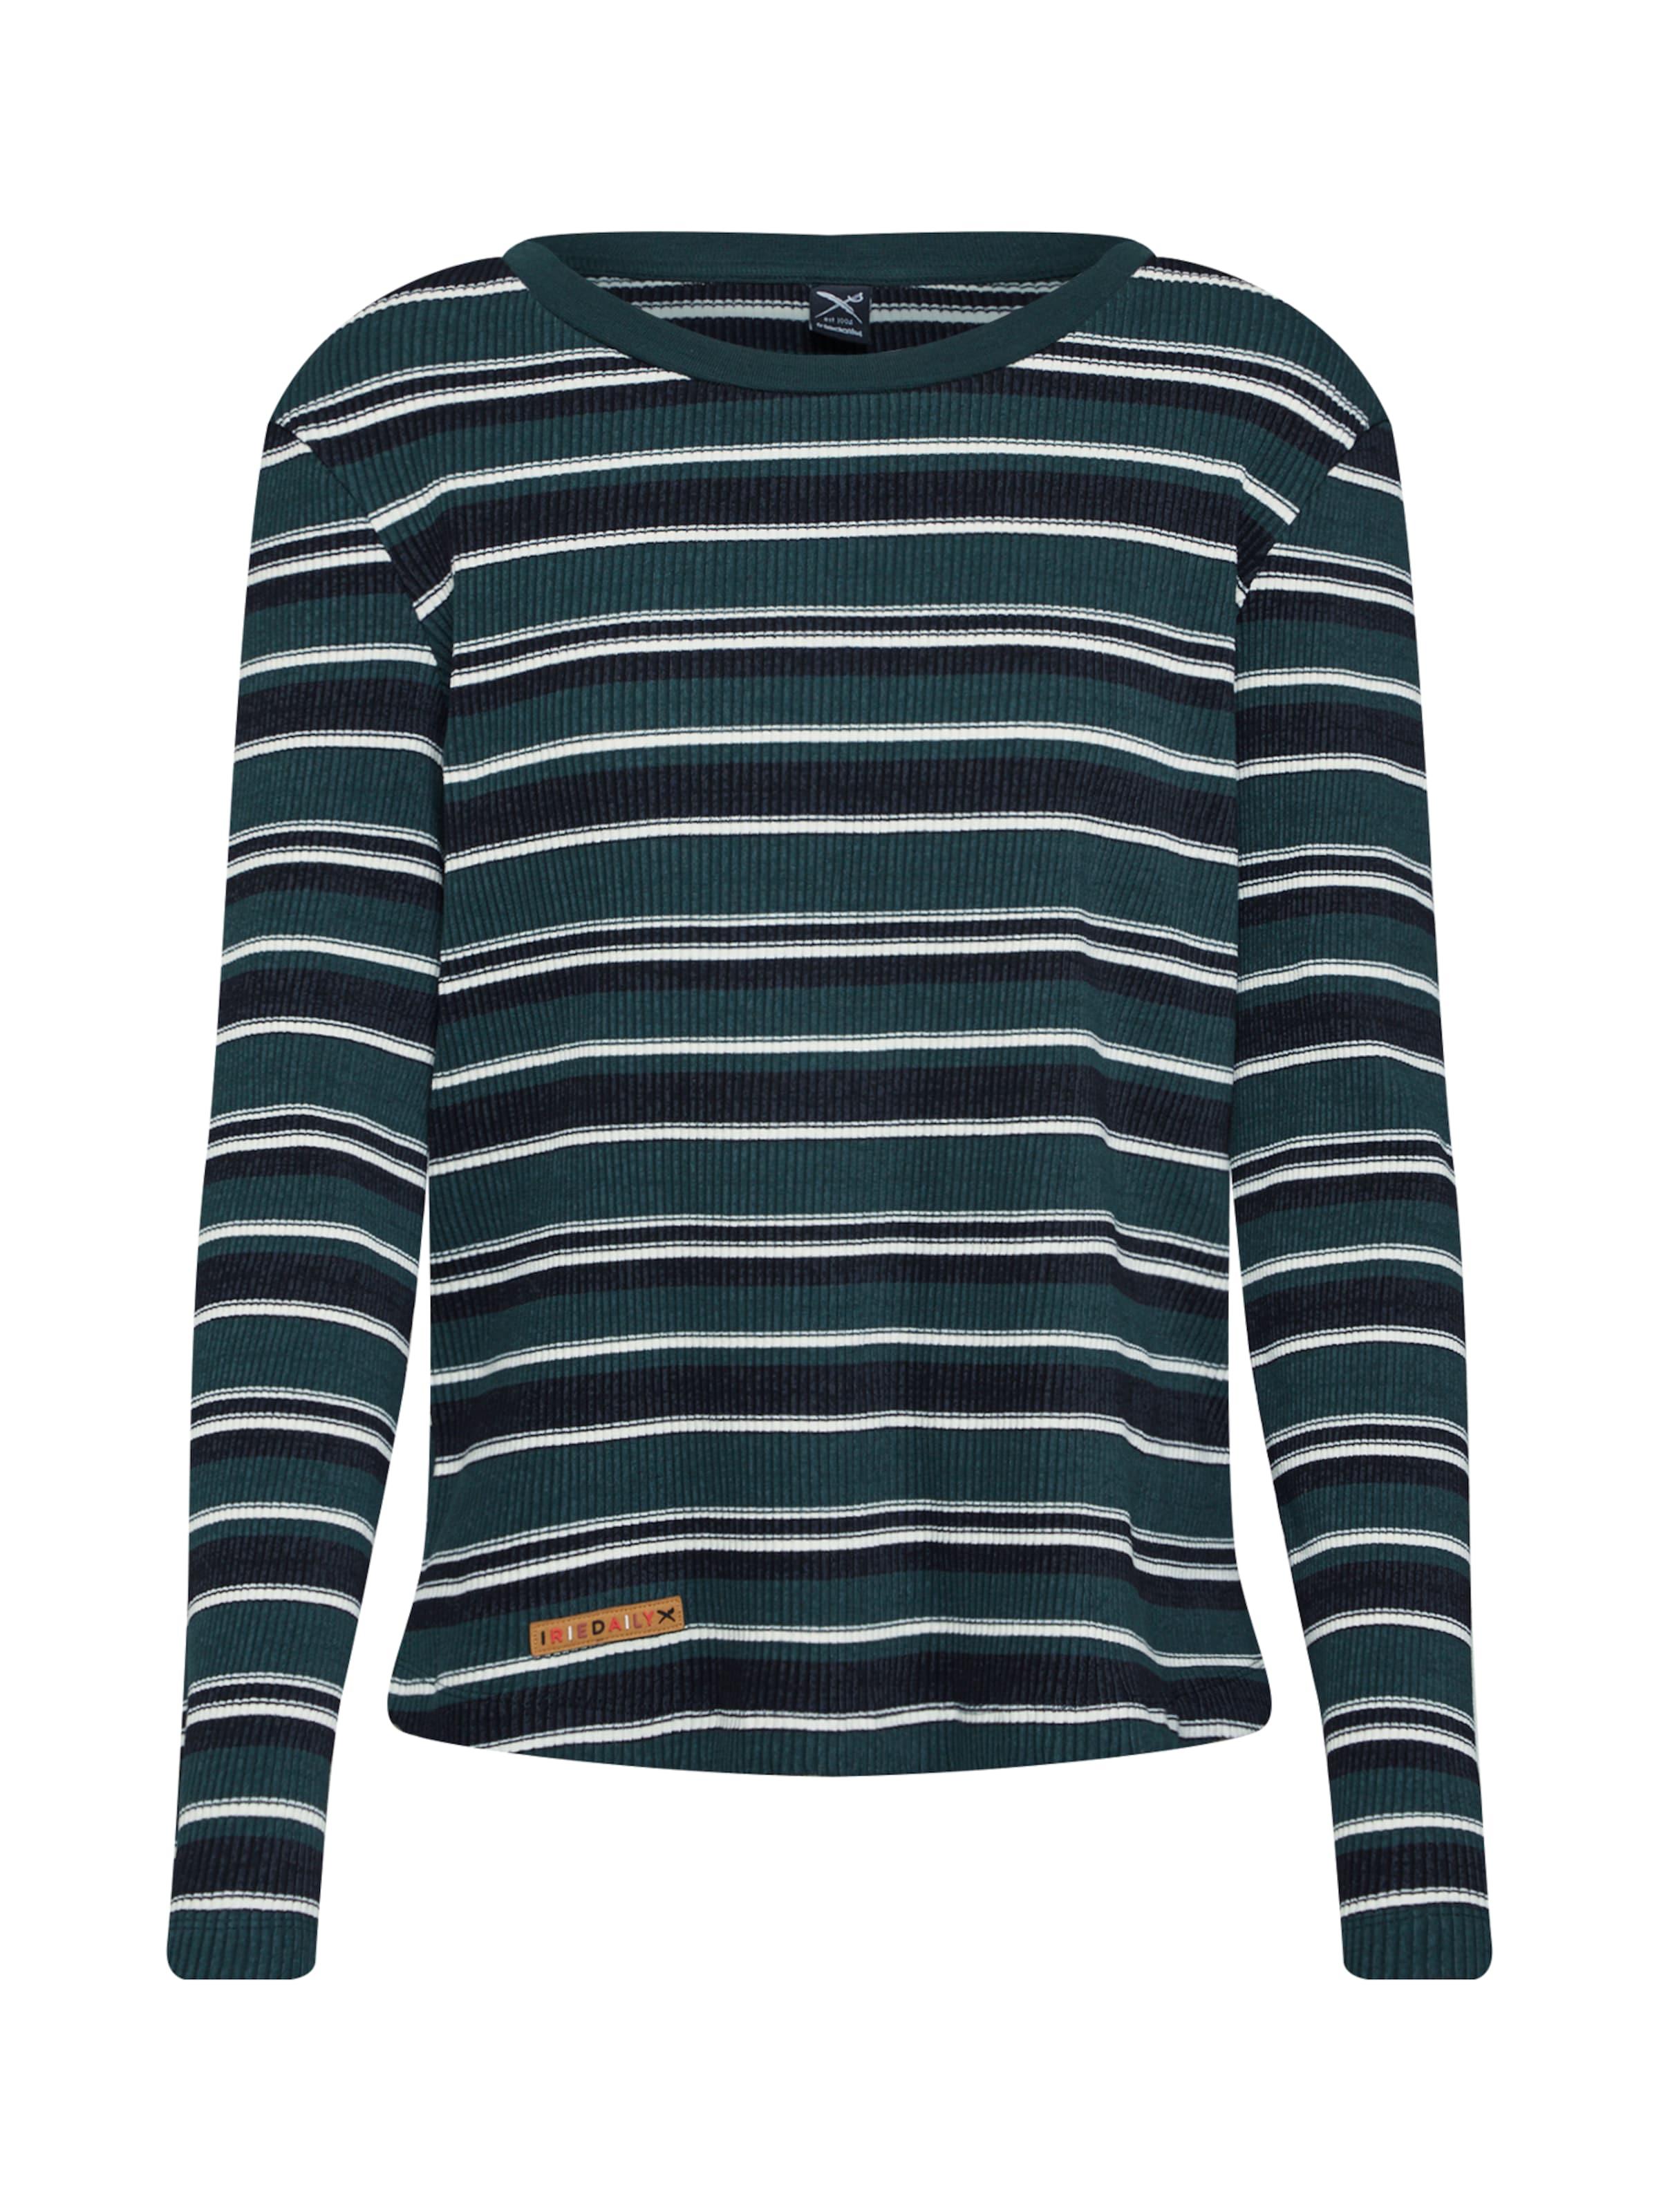 'emma shirt Peel Ls' Iriedaily T Vert Foncé En zMpSGqUV